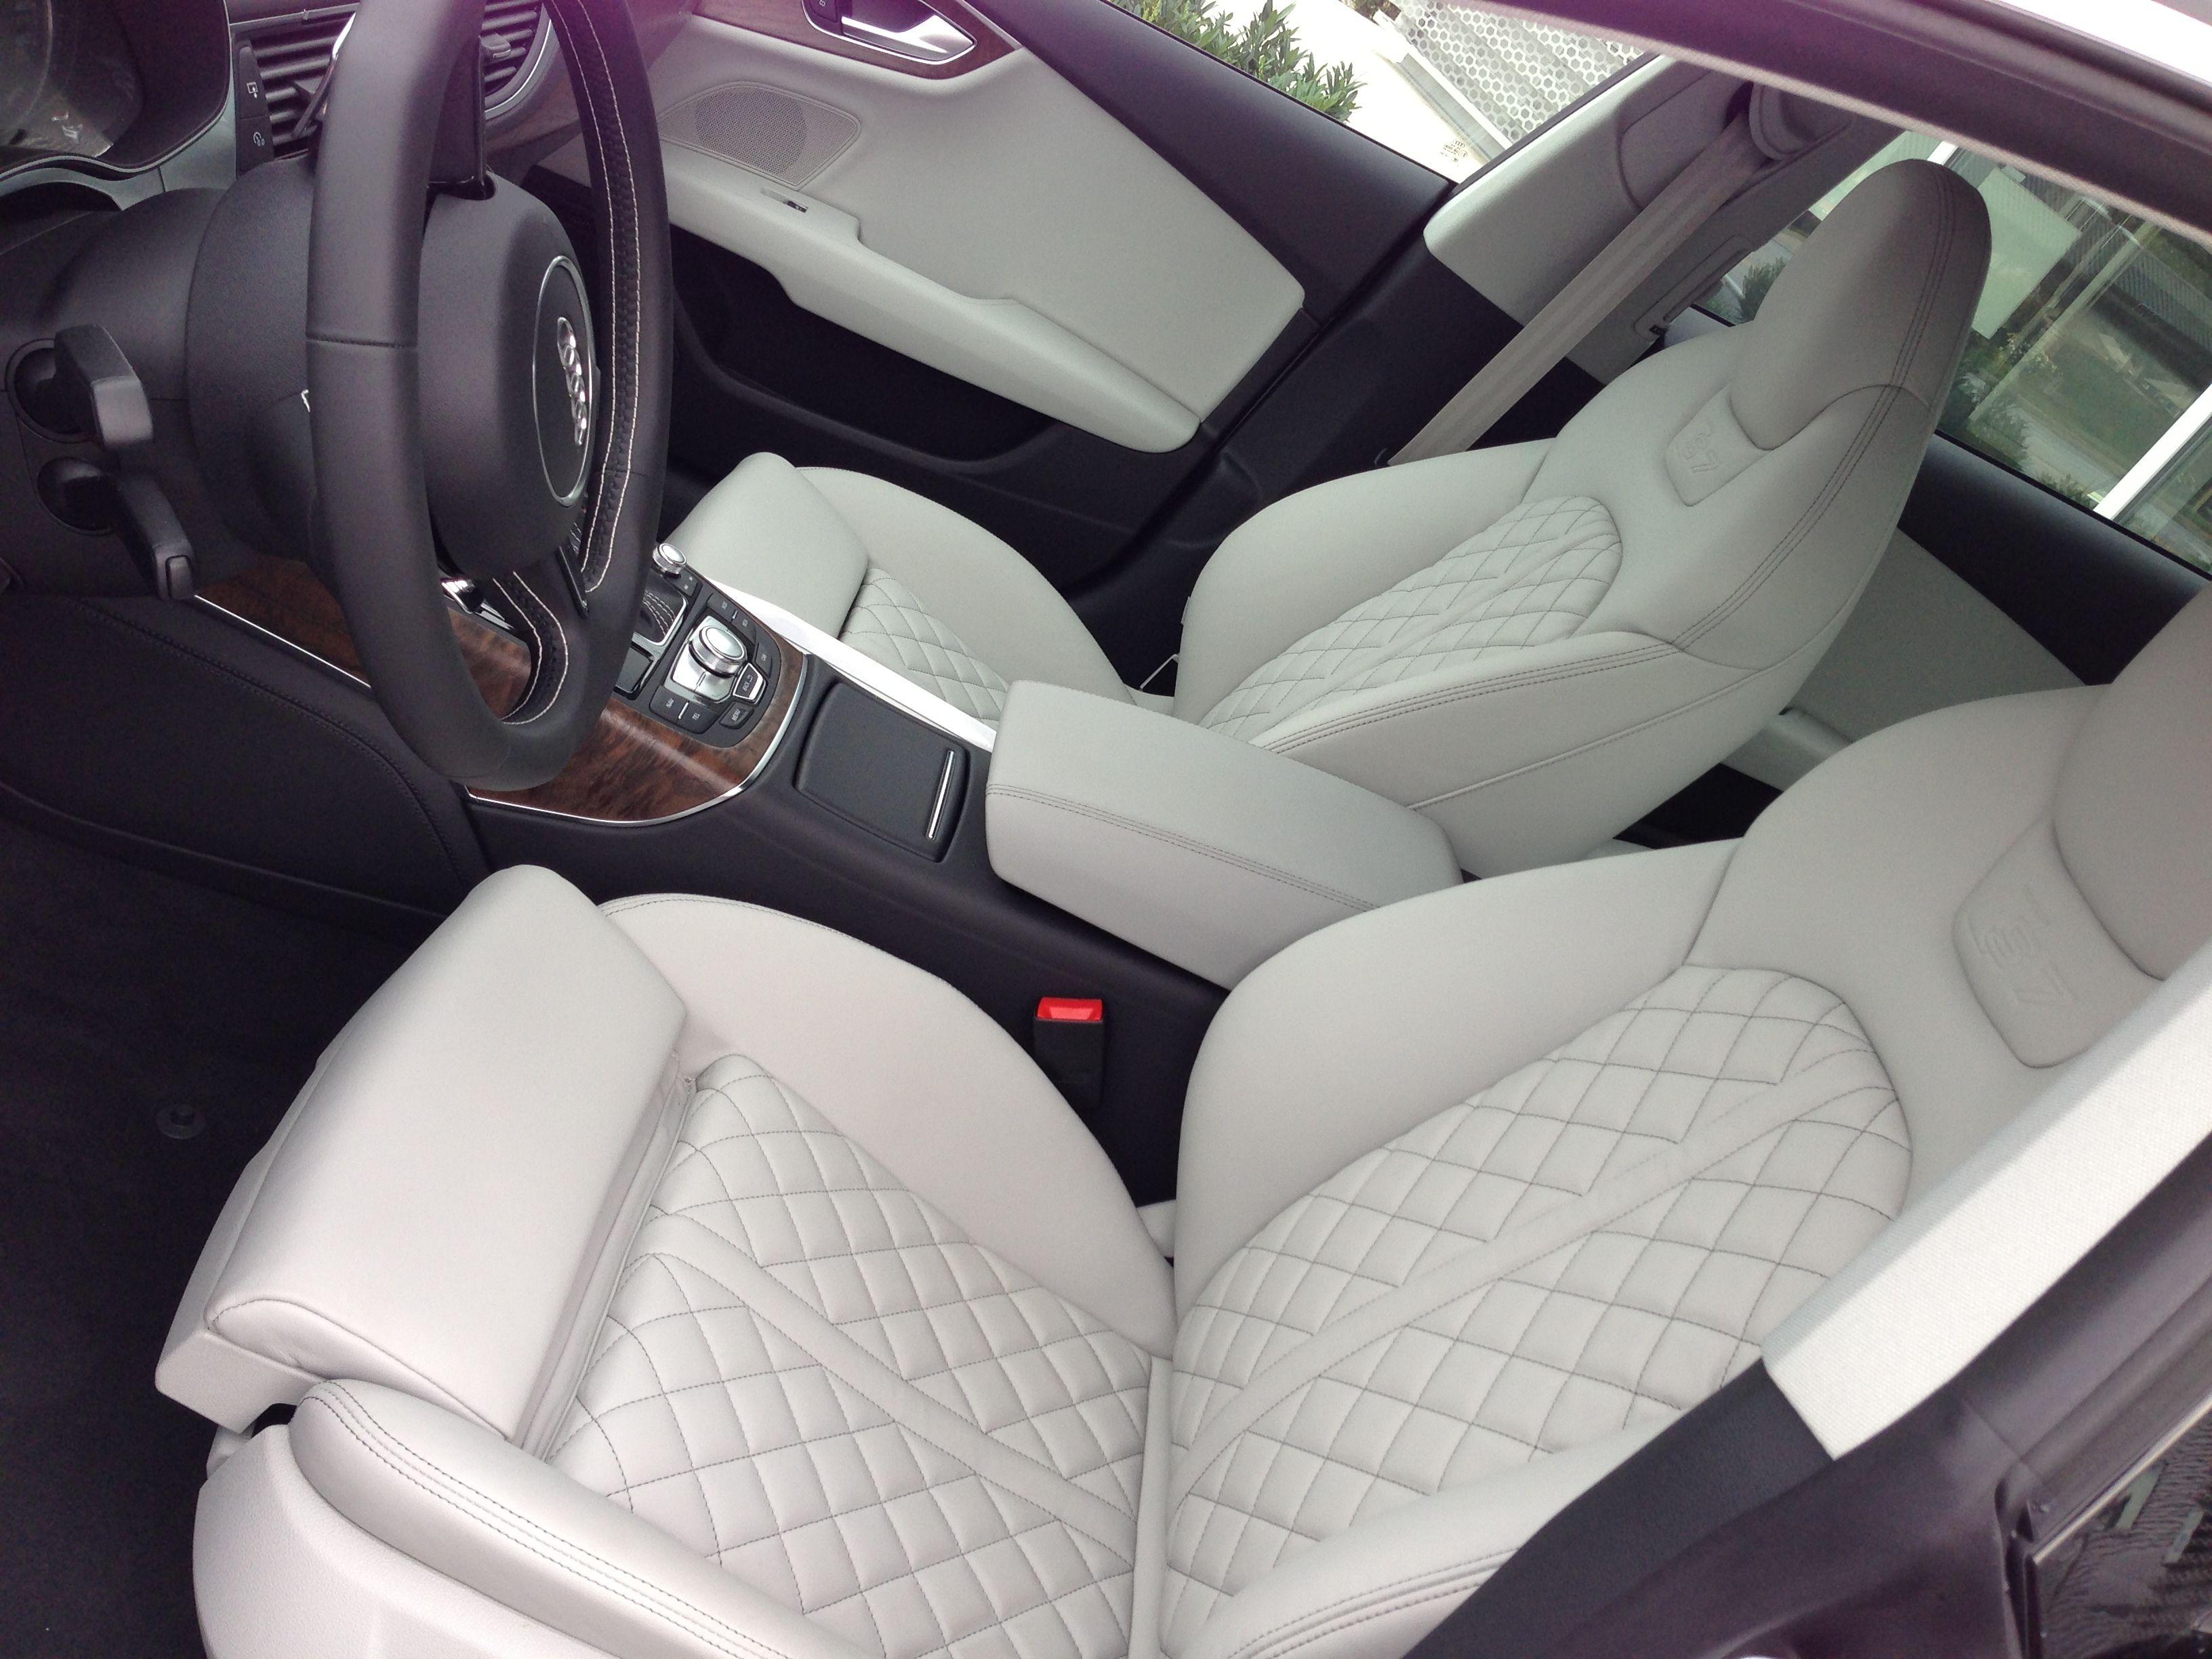 2013 Audi S7 Love The Interior W The White Diamond Stitch Leather Leather Car Seats Custom Car Seats Automotive Upholstery